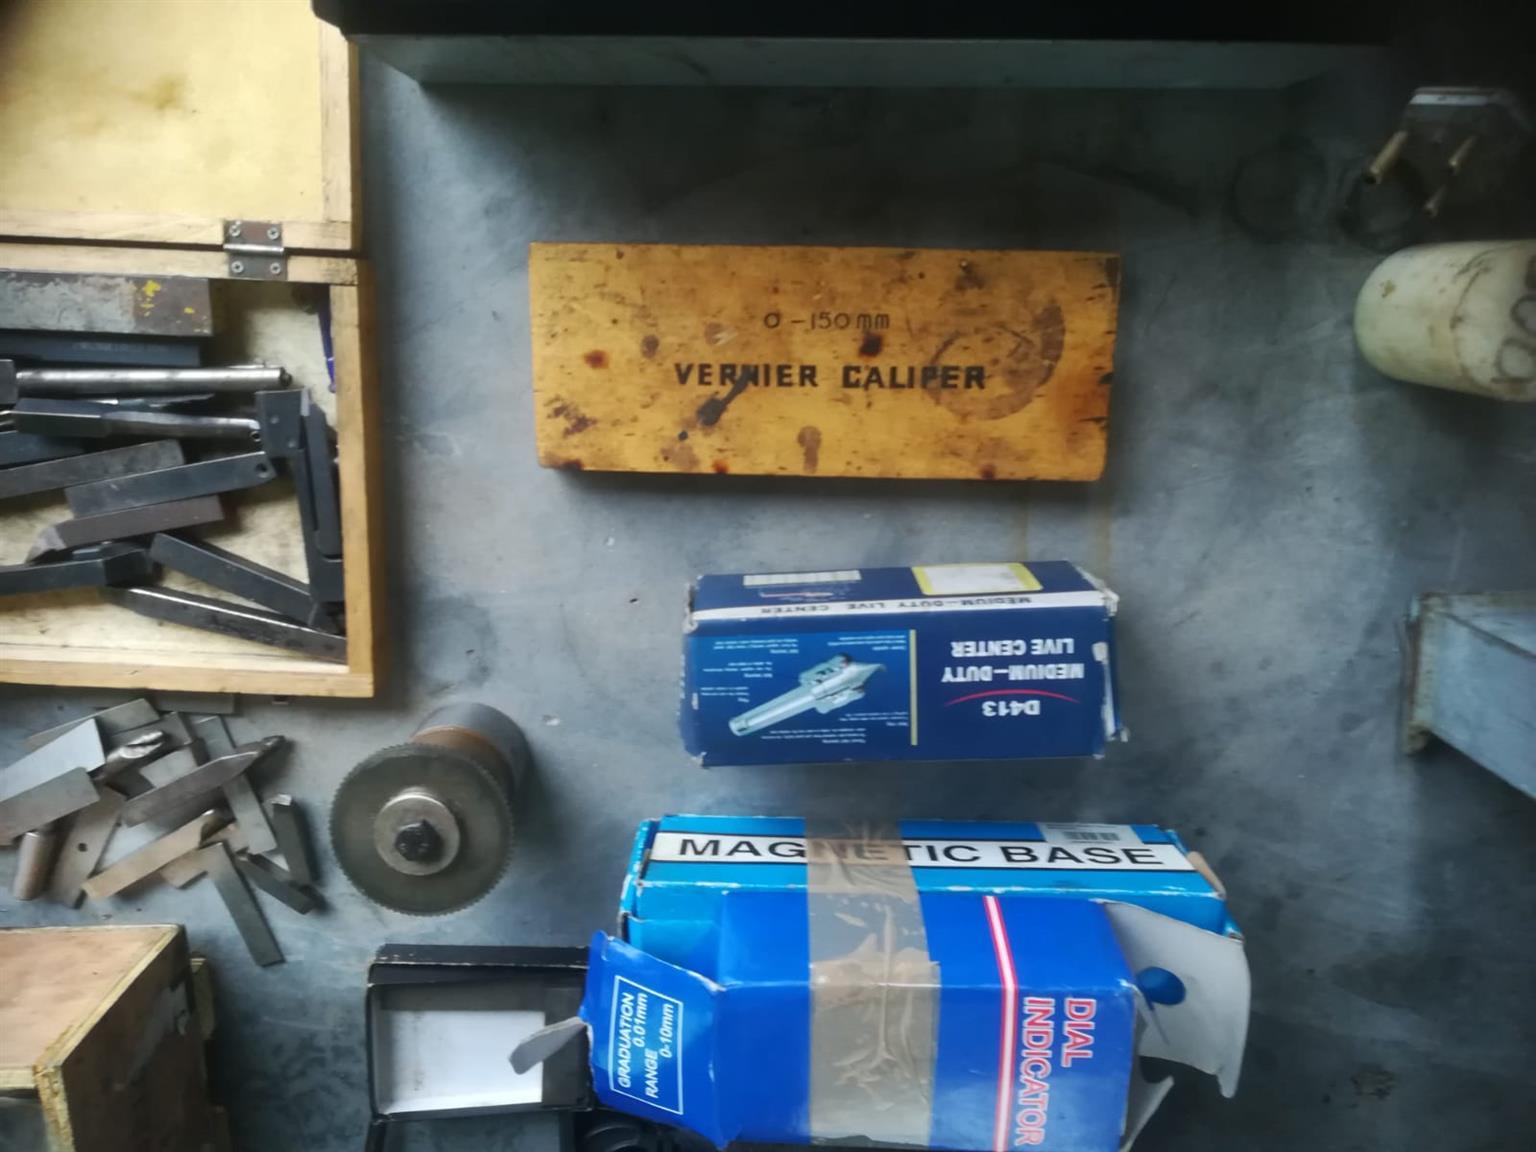 Lathe/Tig welder